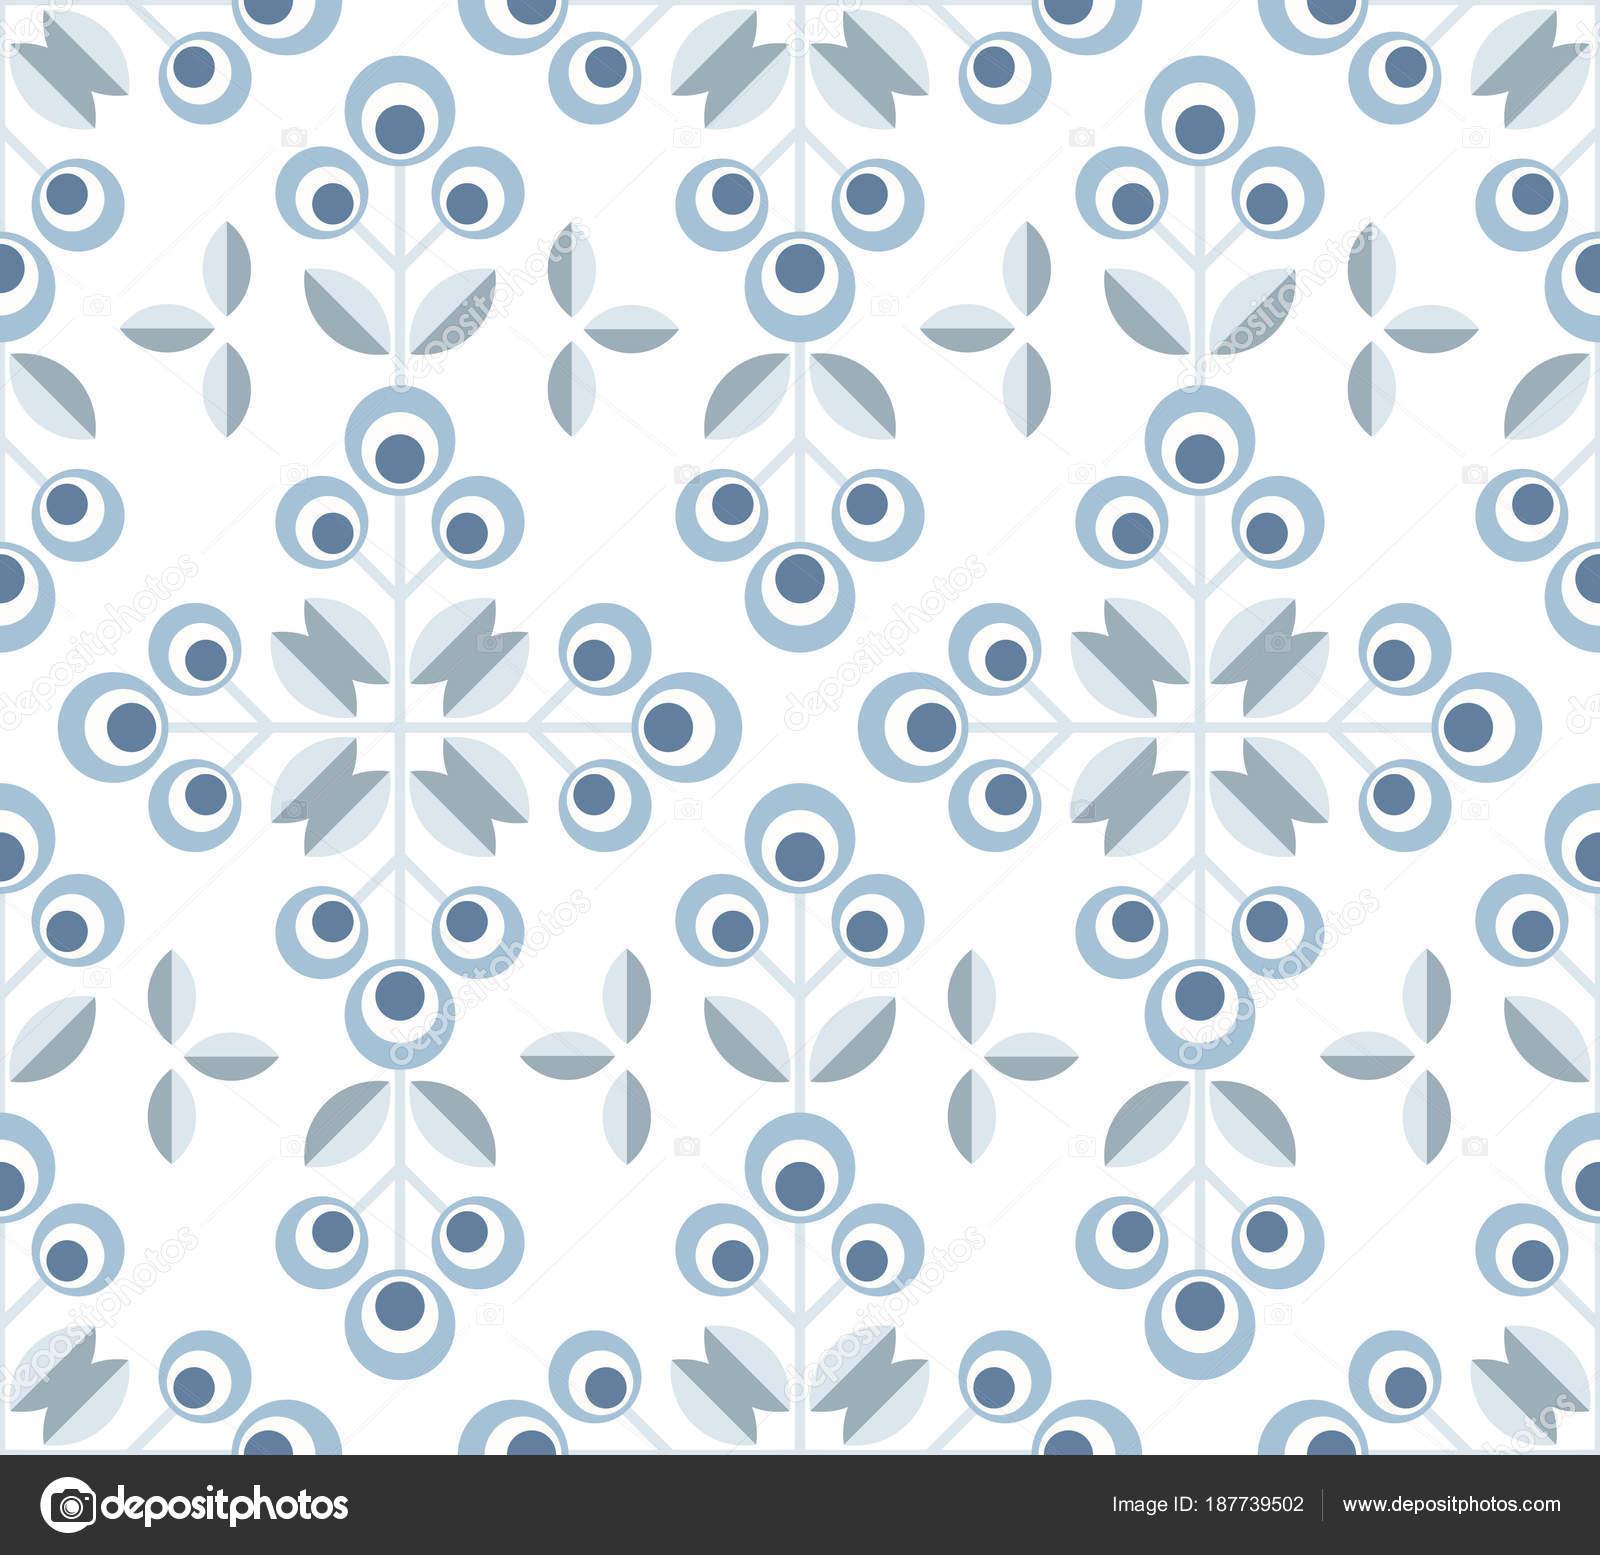 Wunderbar Skandinavische Blumenkarte Mitte Jahrhundert Tapete, Nahtlose Muster U2014  Stockvektor